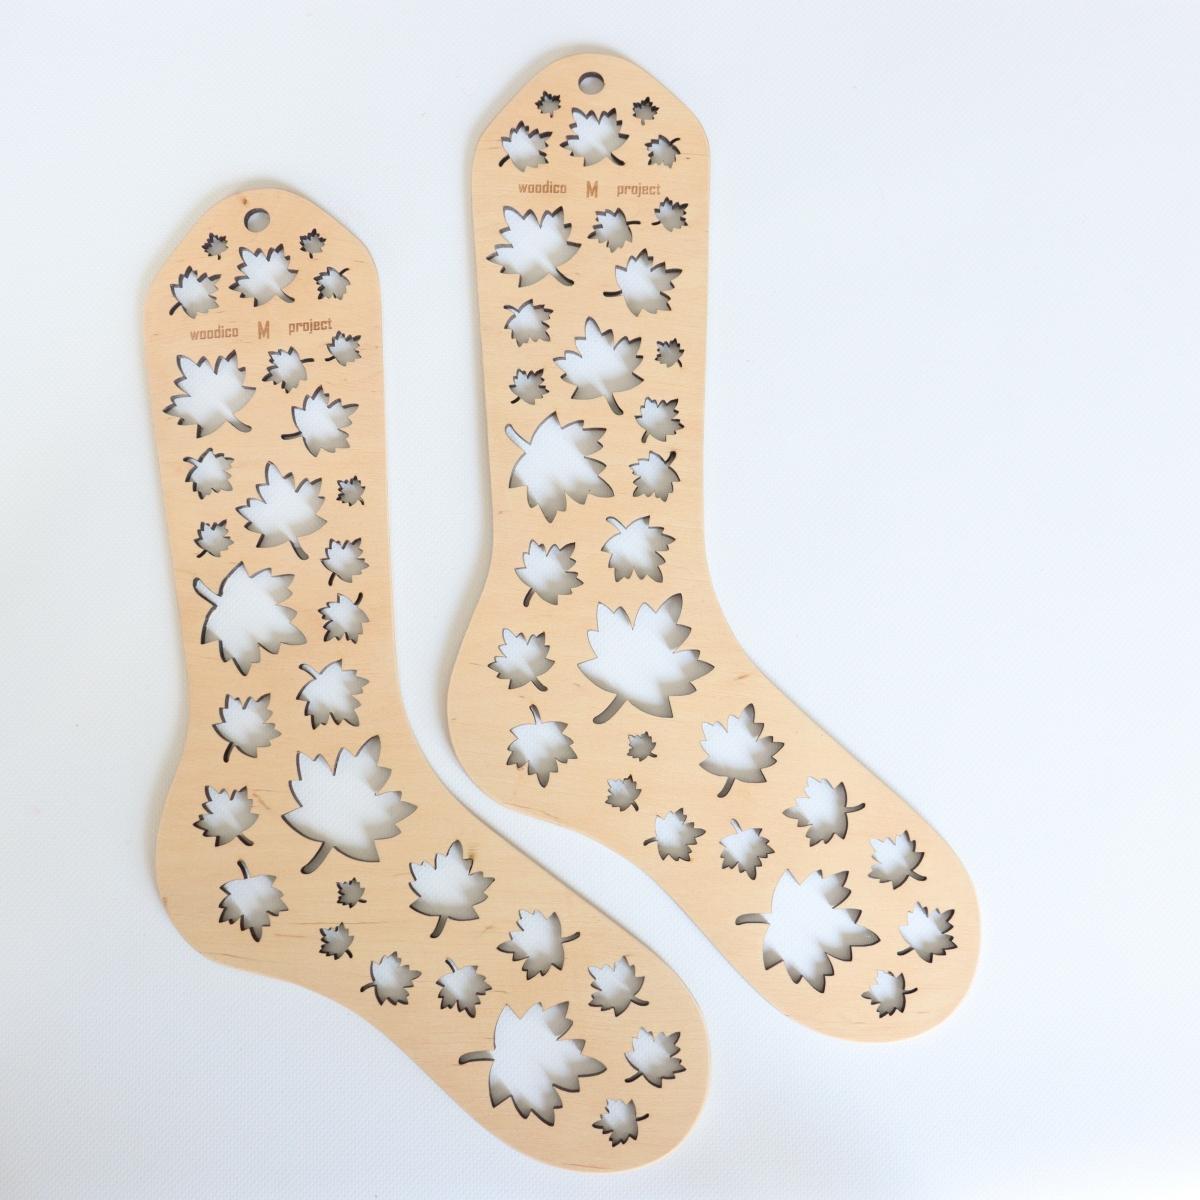 woodico.pro wooden sock blockers maple leaf 1 1200x1200 - Wooden sock blockers / Maple-Leaf